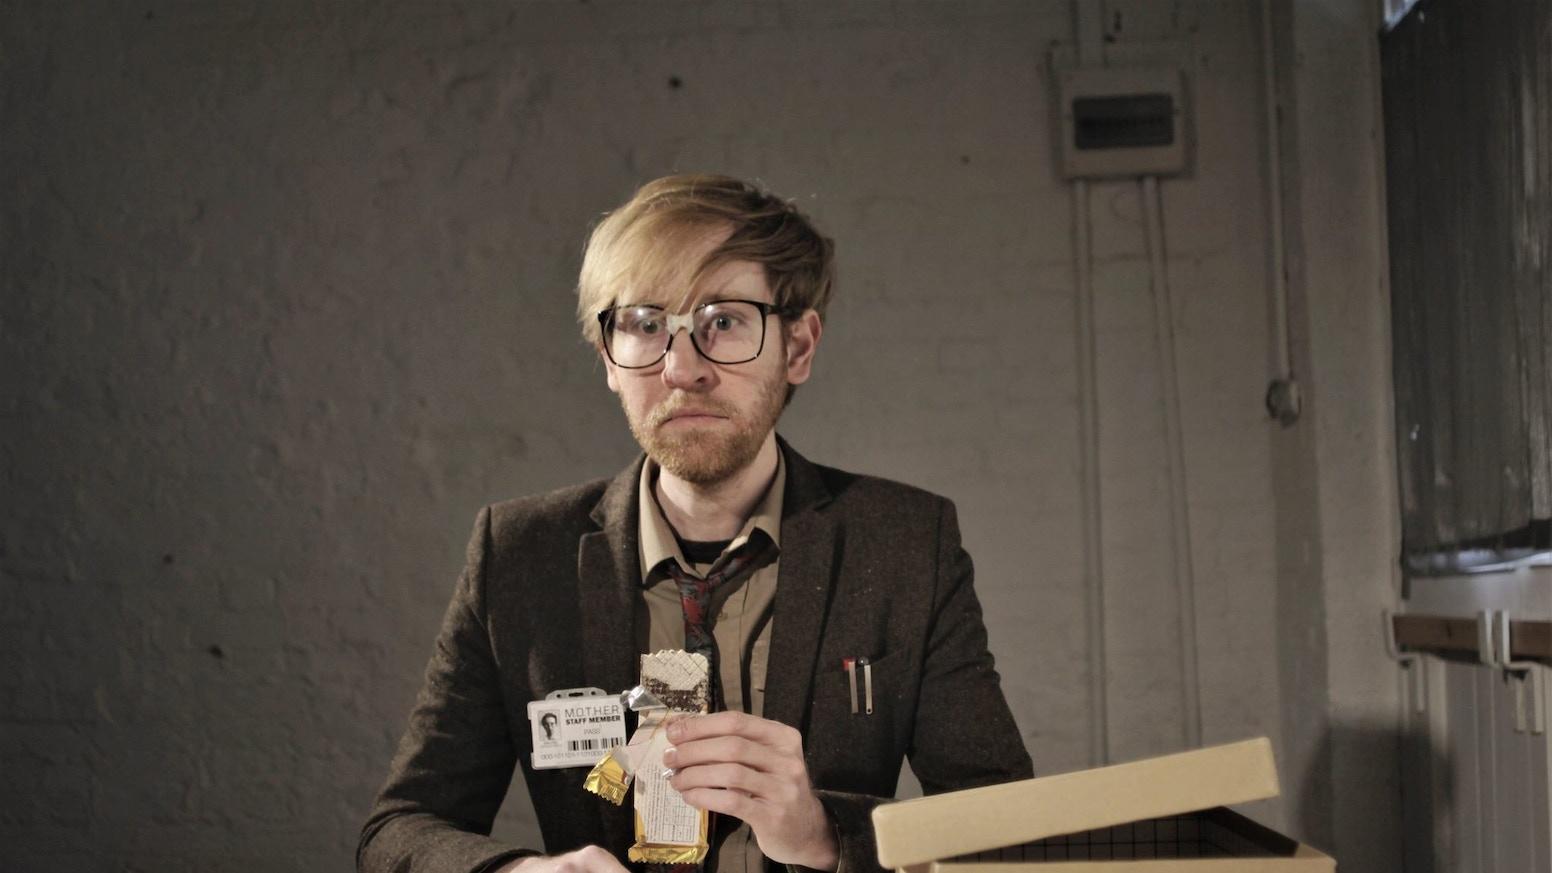 M O T H E R Knows Best - Series 2 by Chris Mayo — Kickstarter